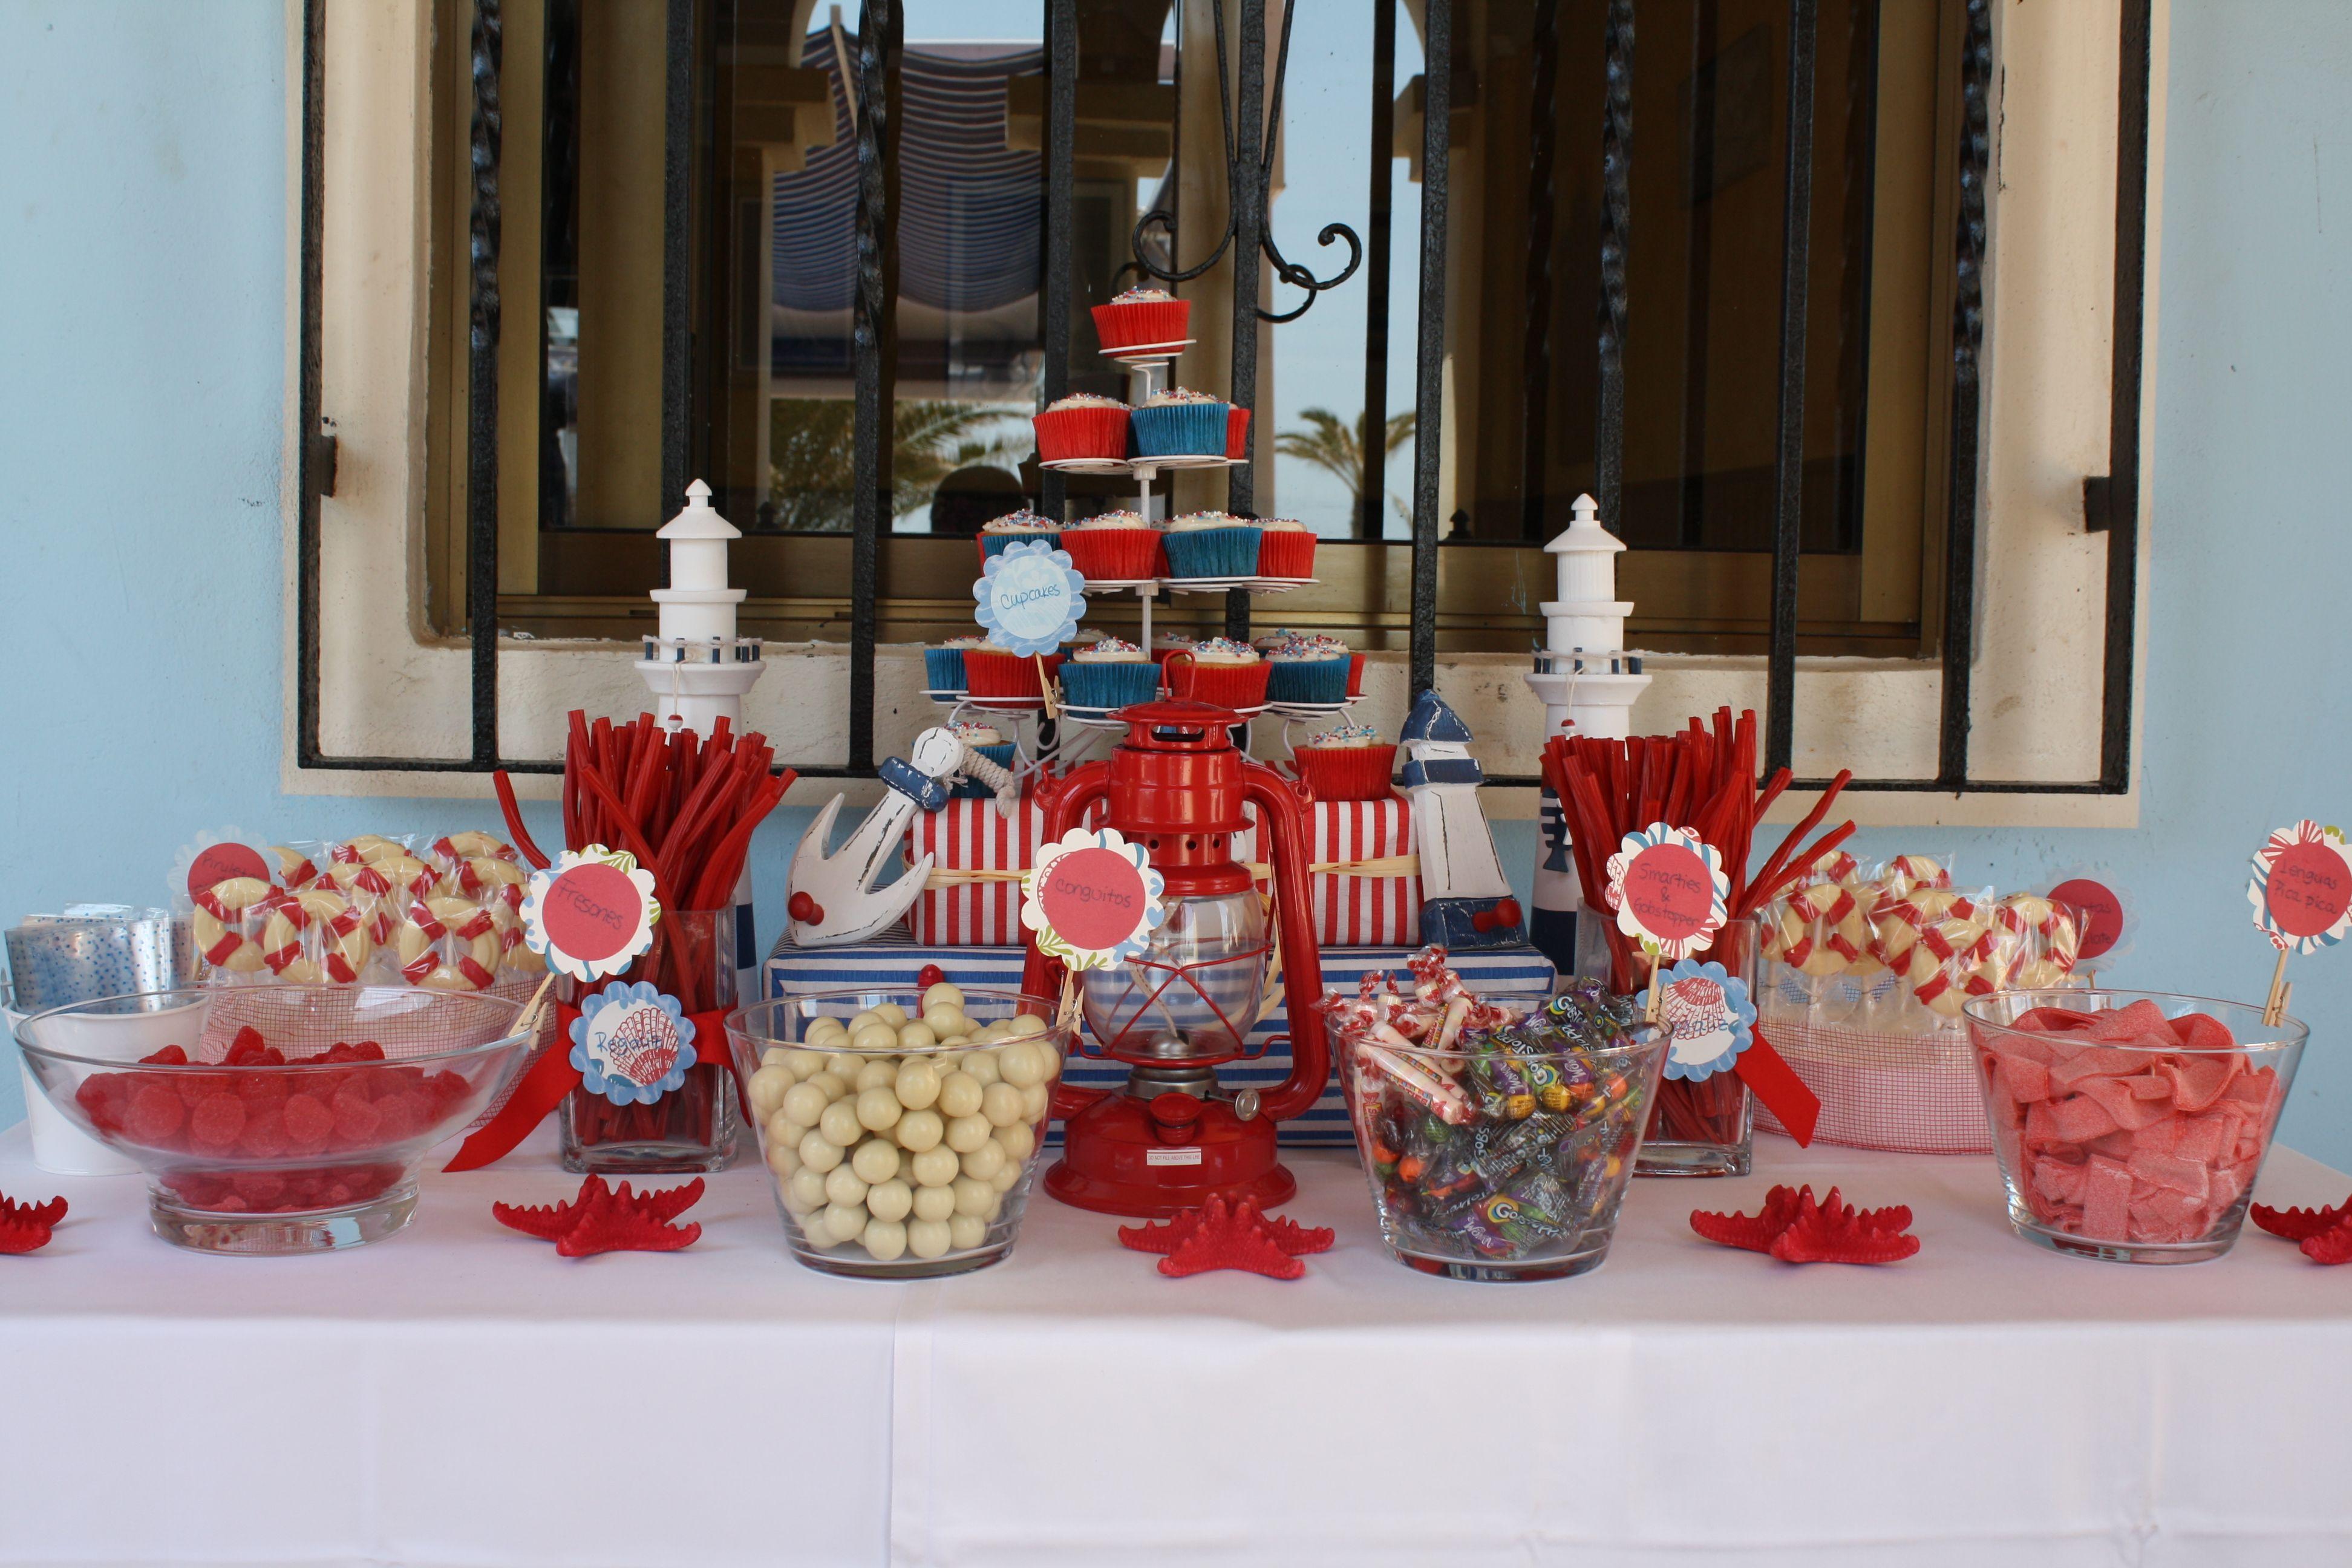 Mesa de dulces marinera bubblykido ejemplos para mesa de chuches pinterest mesa de - Fiesta marinera decoracion ...